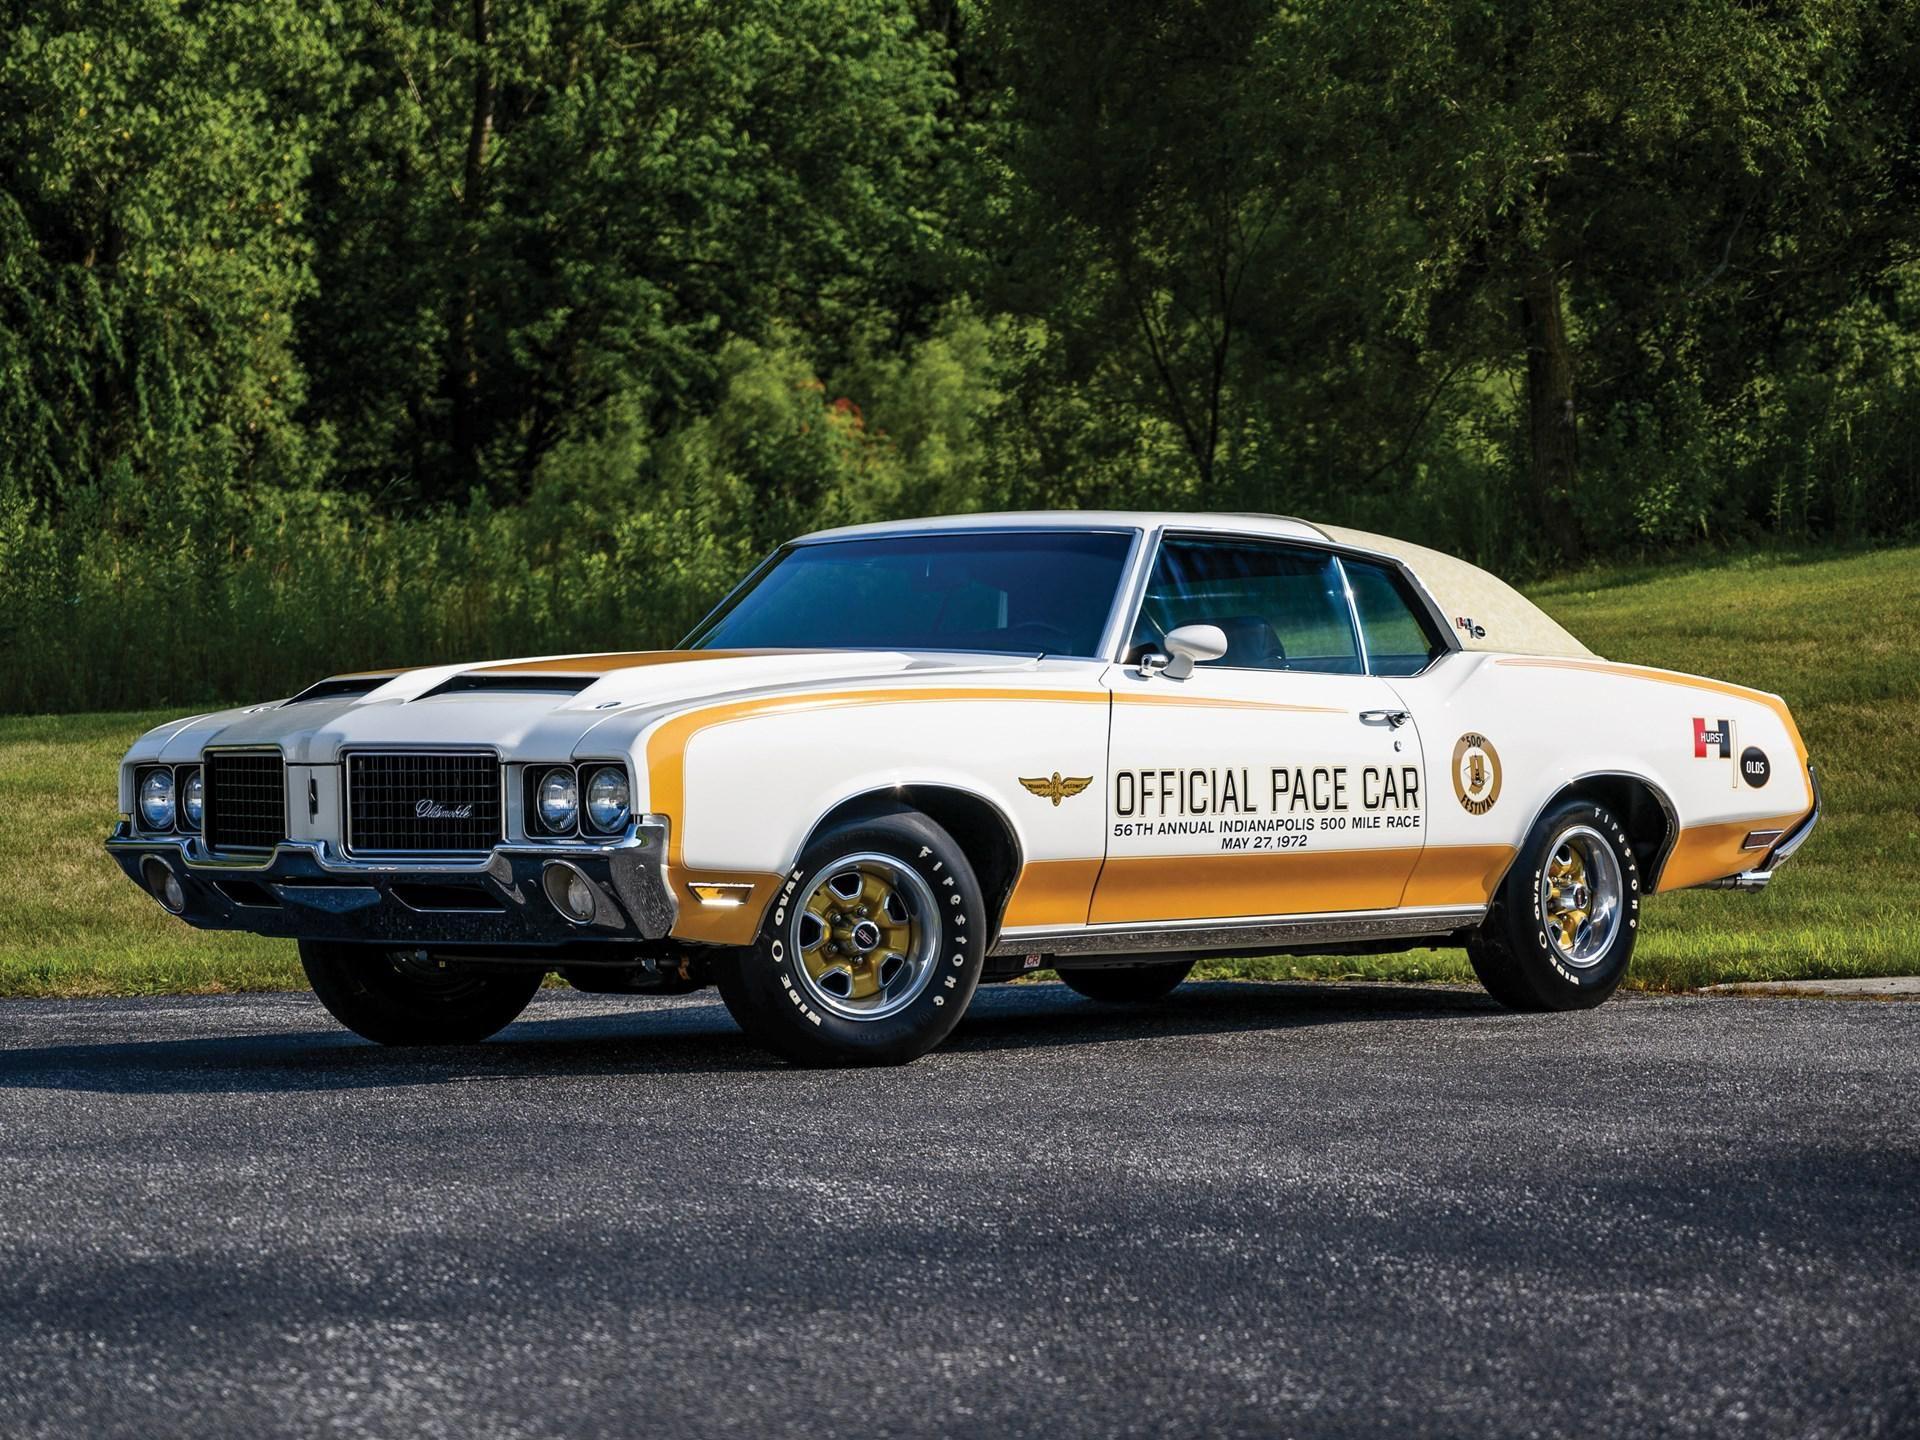 1972 Oldsmobile 442 Indianapolis 500 Pace Car Replica